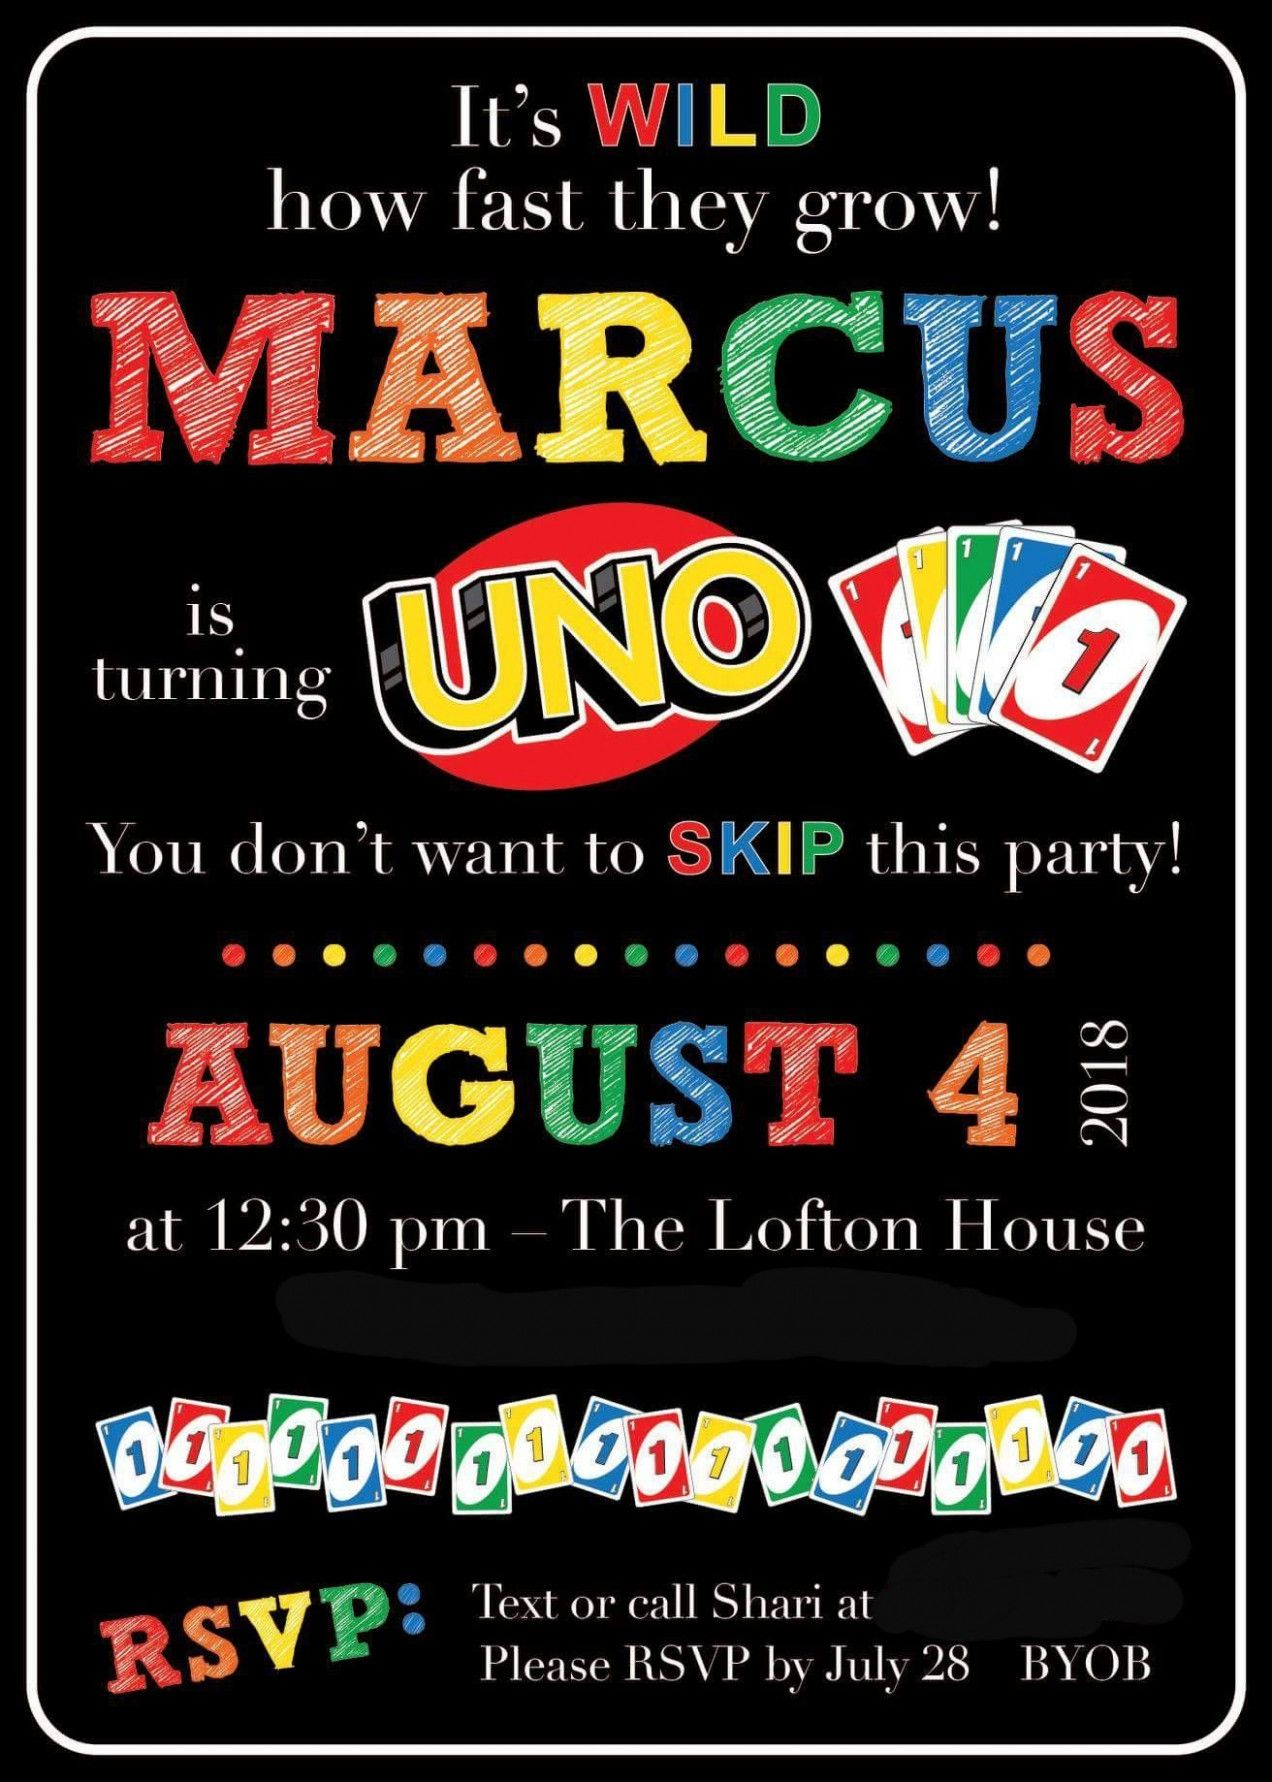 Uno Card Invitation Template  4st birthday boy themes, Birthday